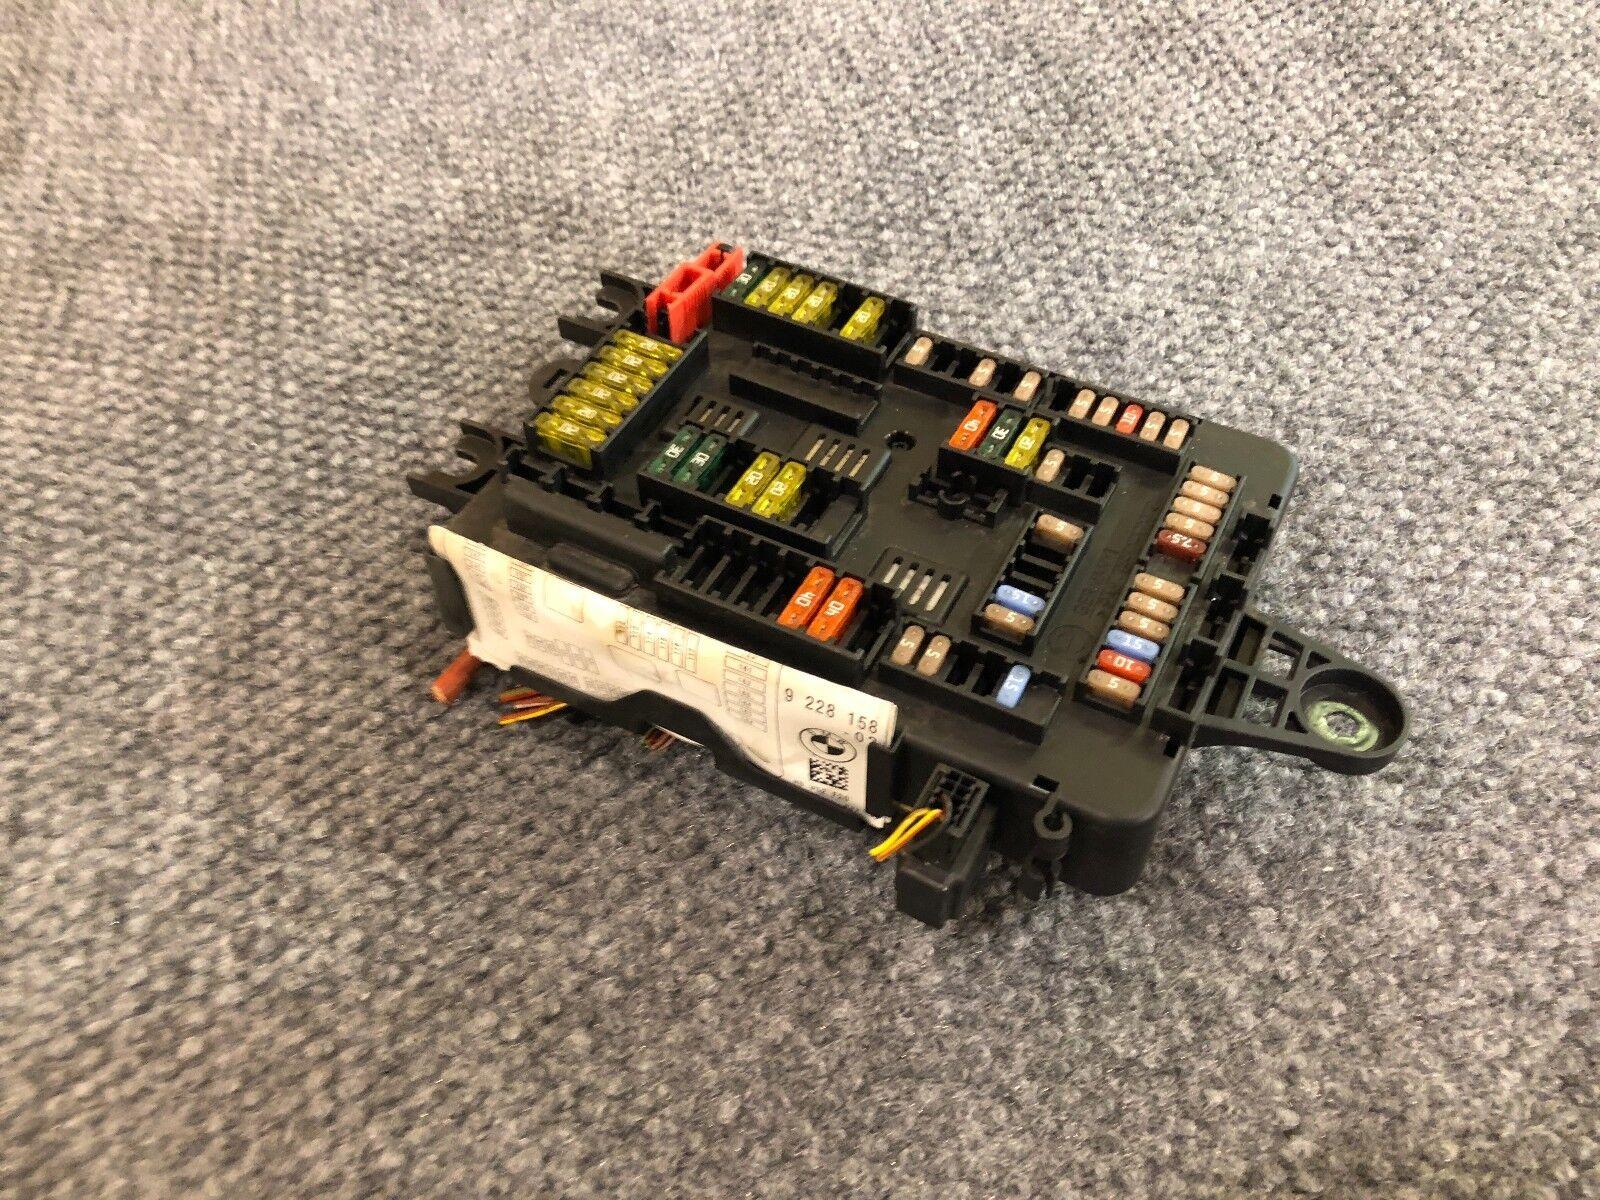 Bmw F32 F30 335i 328i 12 17 Fuse Box Module Relay Oem For Sale